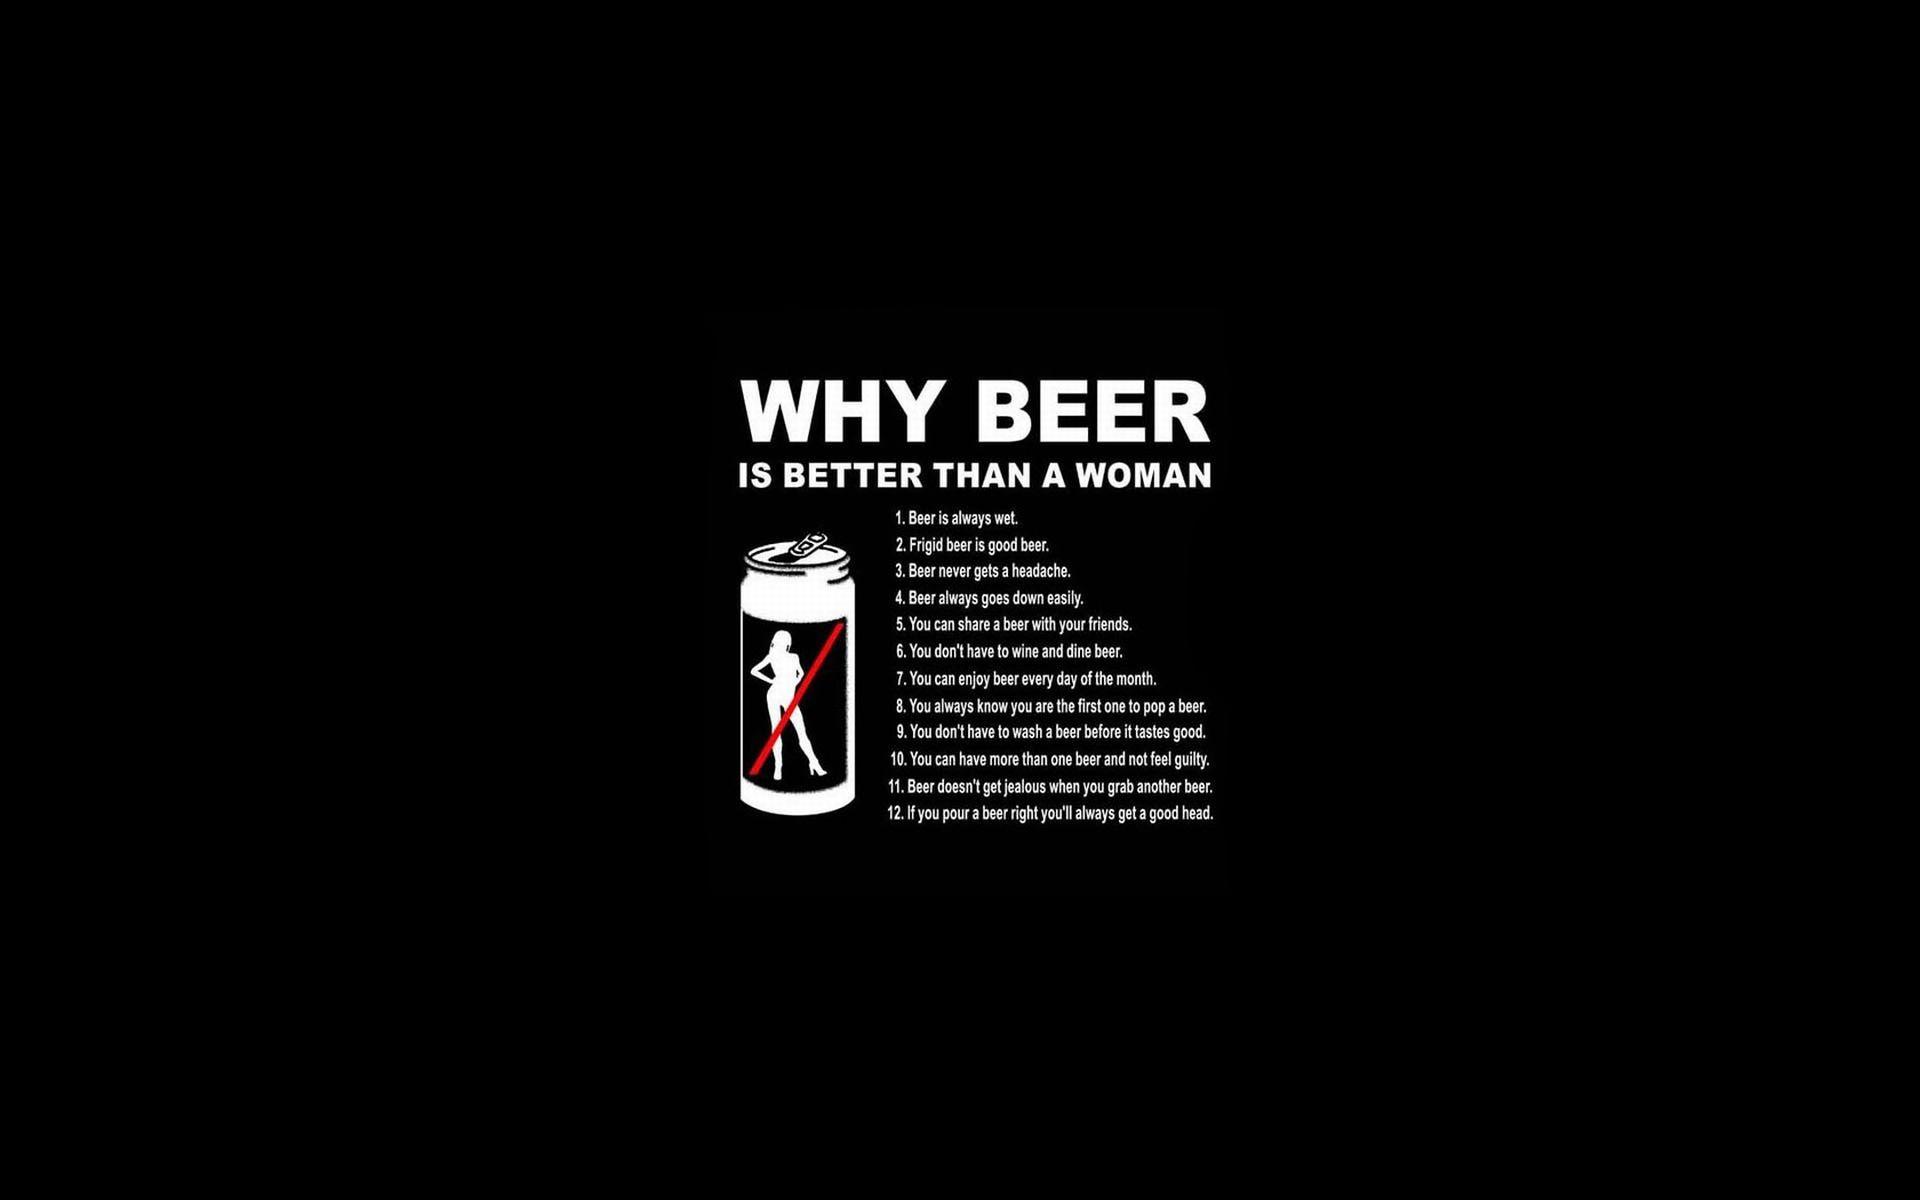 Quotes Humor Funny Beer Dark Black Wallpaper 1920x1200 22783